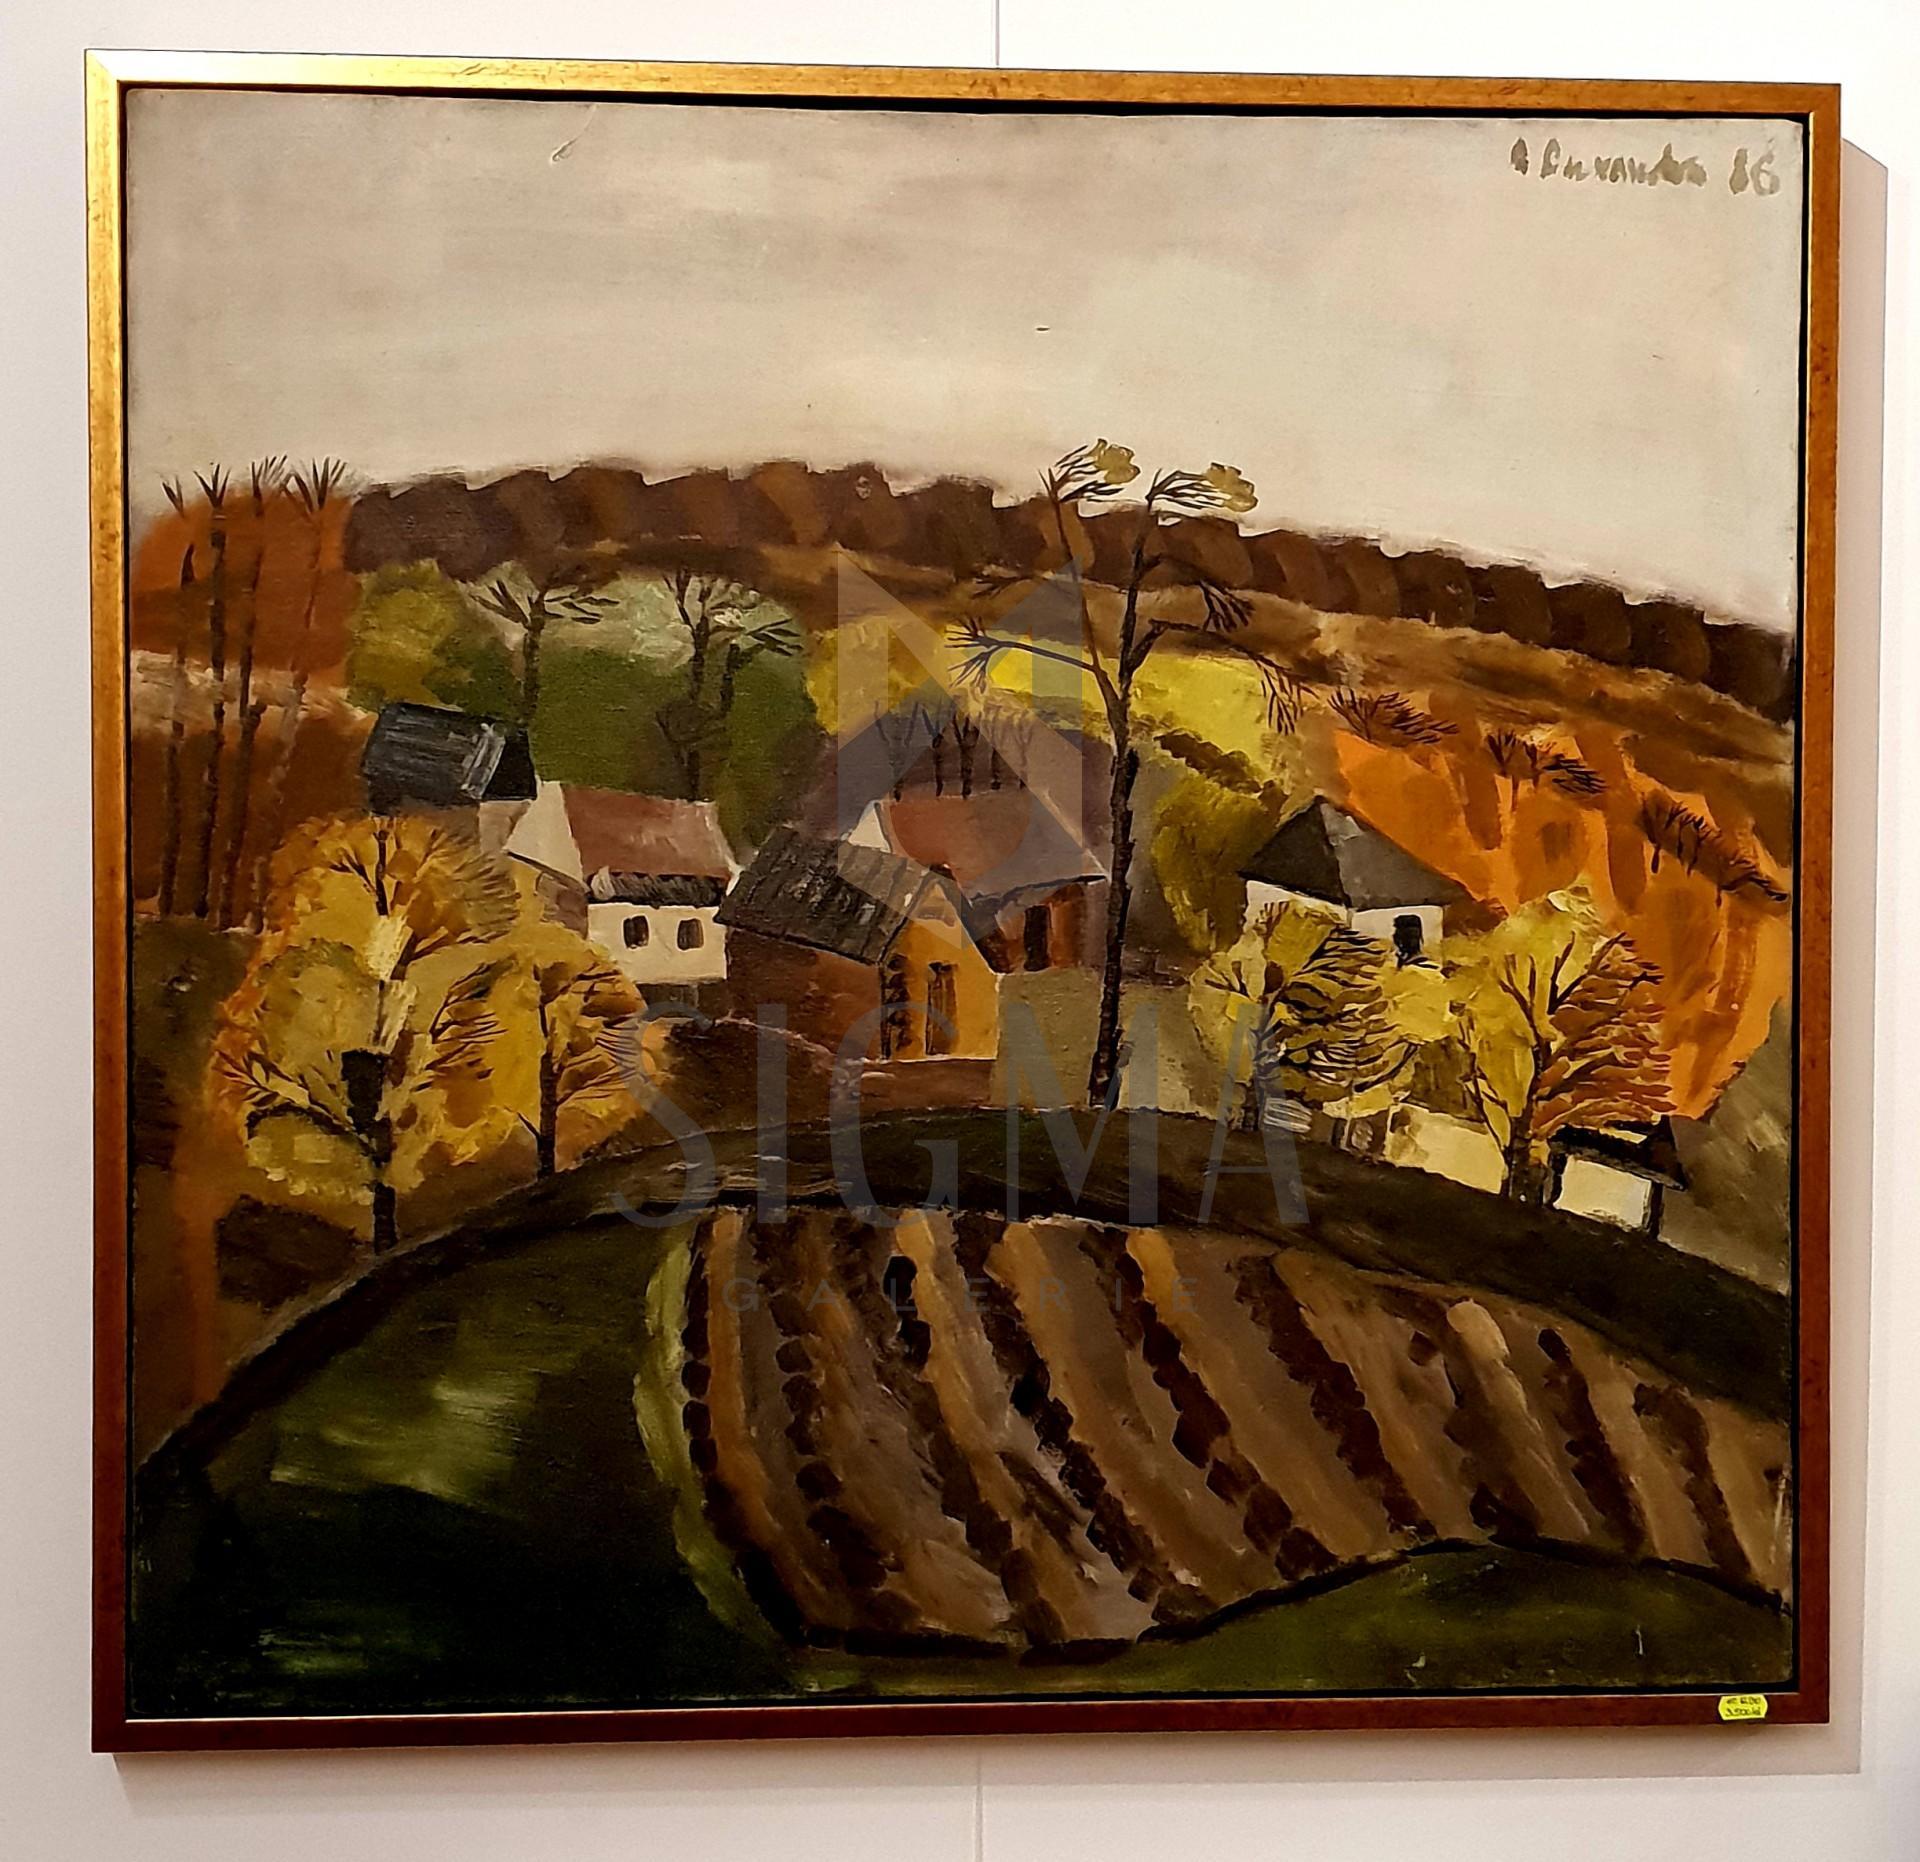 Tablou, Ana Ruxandra Ilfoveanu - Peisaj de toamna la Radesti- ulei pe panza,   81,5 x 85  cm, semnat dreapta sus, datat 1986